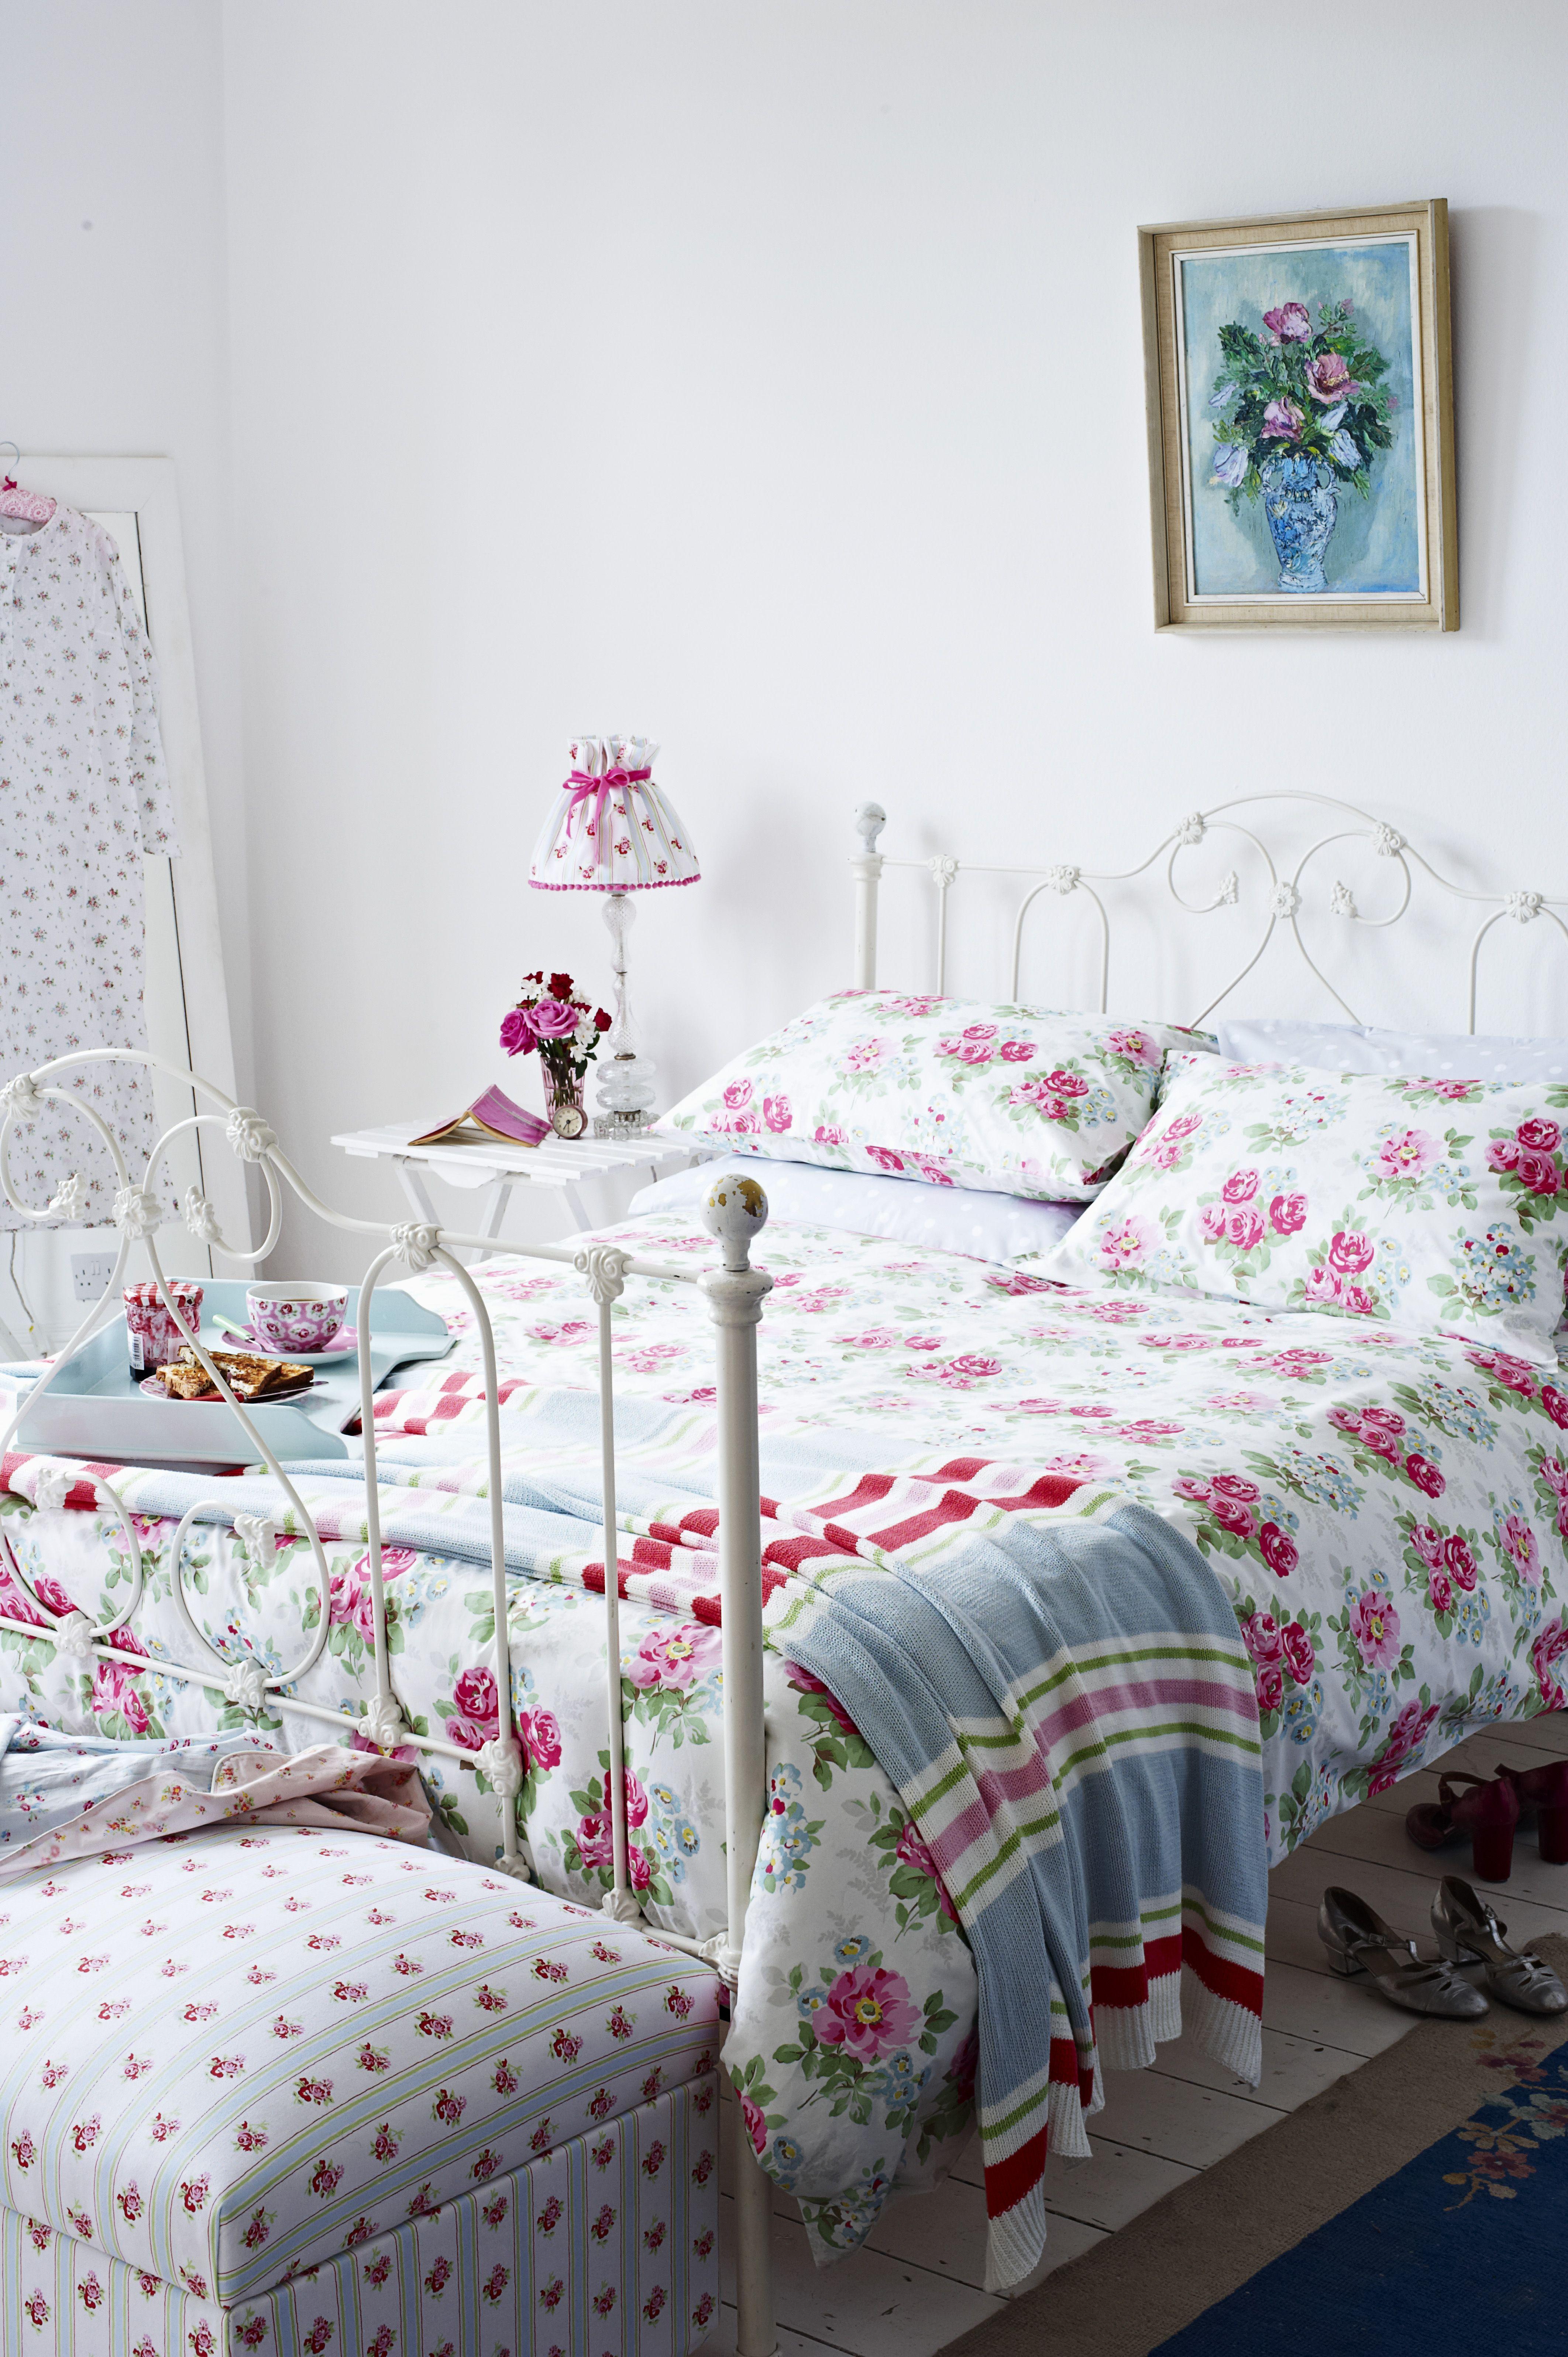 Bedroom Decorating Ideas Cath Kidston blommigt lantligt | home | pinterest | level, kidston and cath kidston